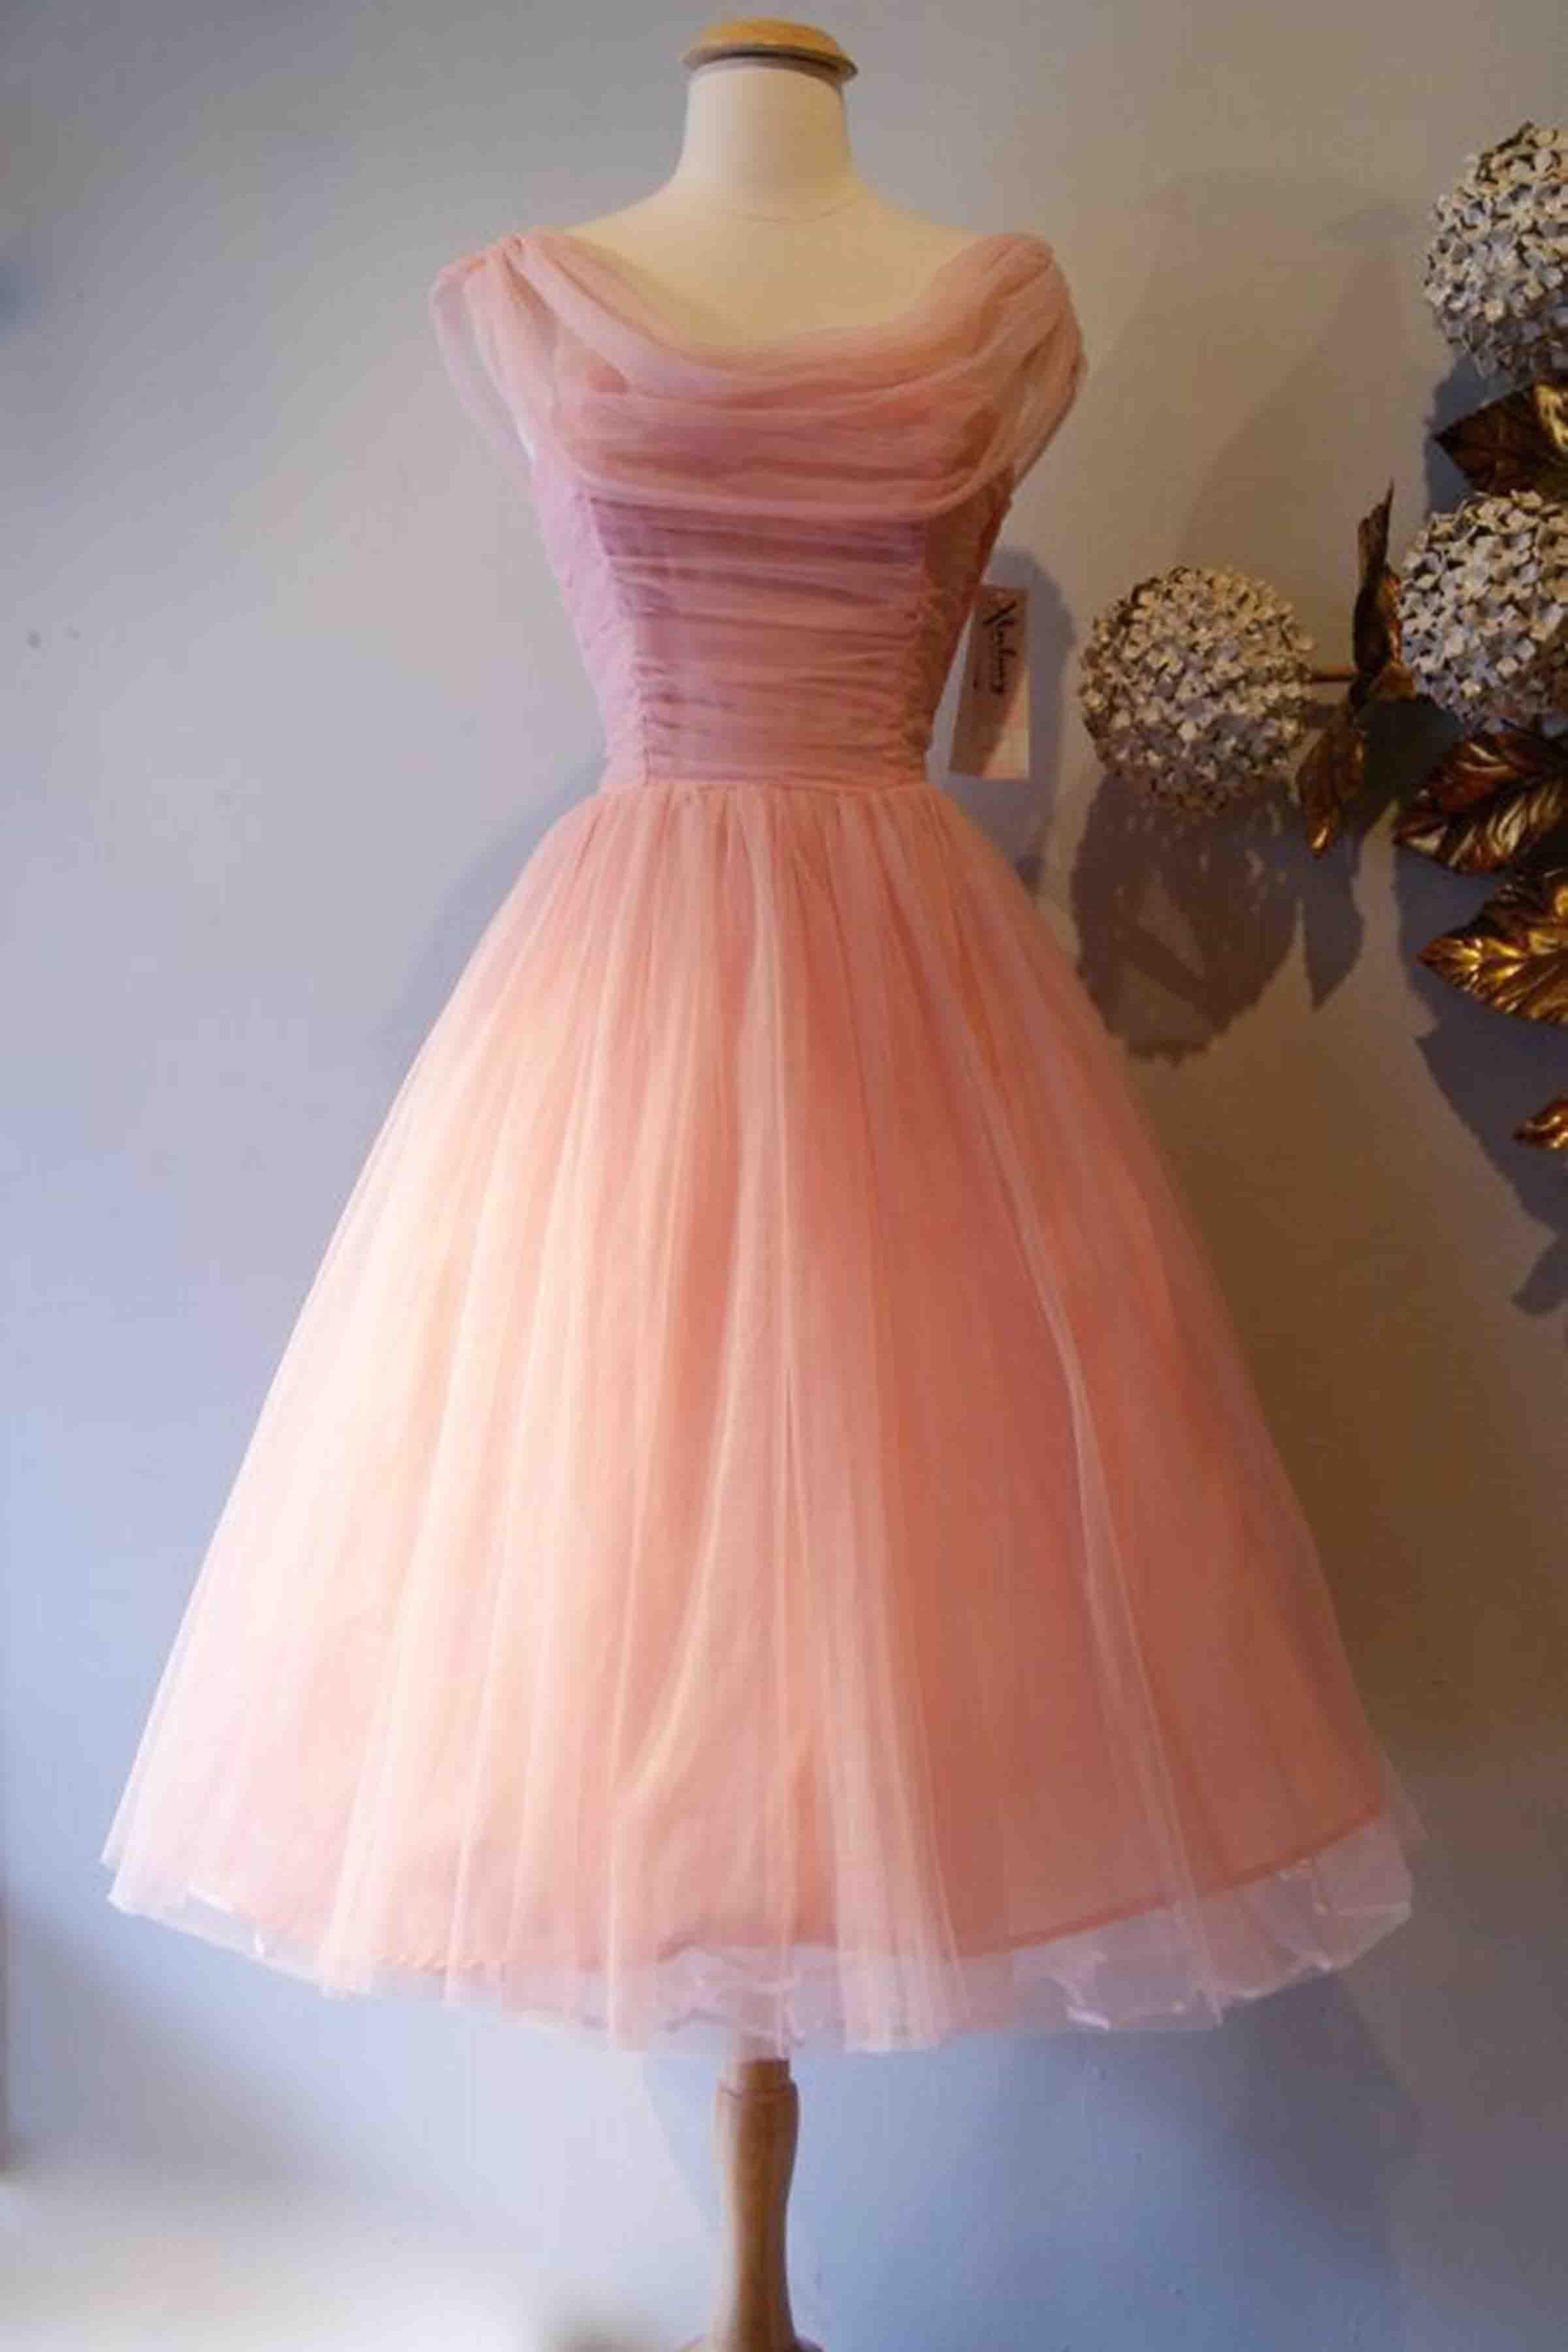 Orange tulle prom dress,vintage prom dress, 2017 new cute ...